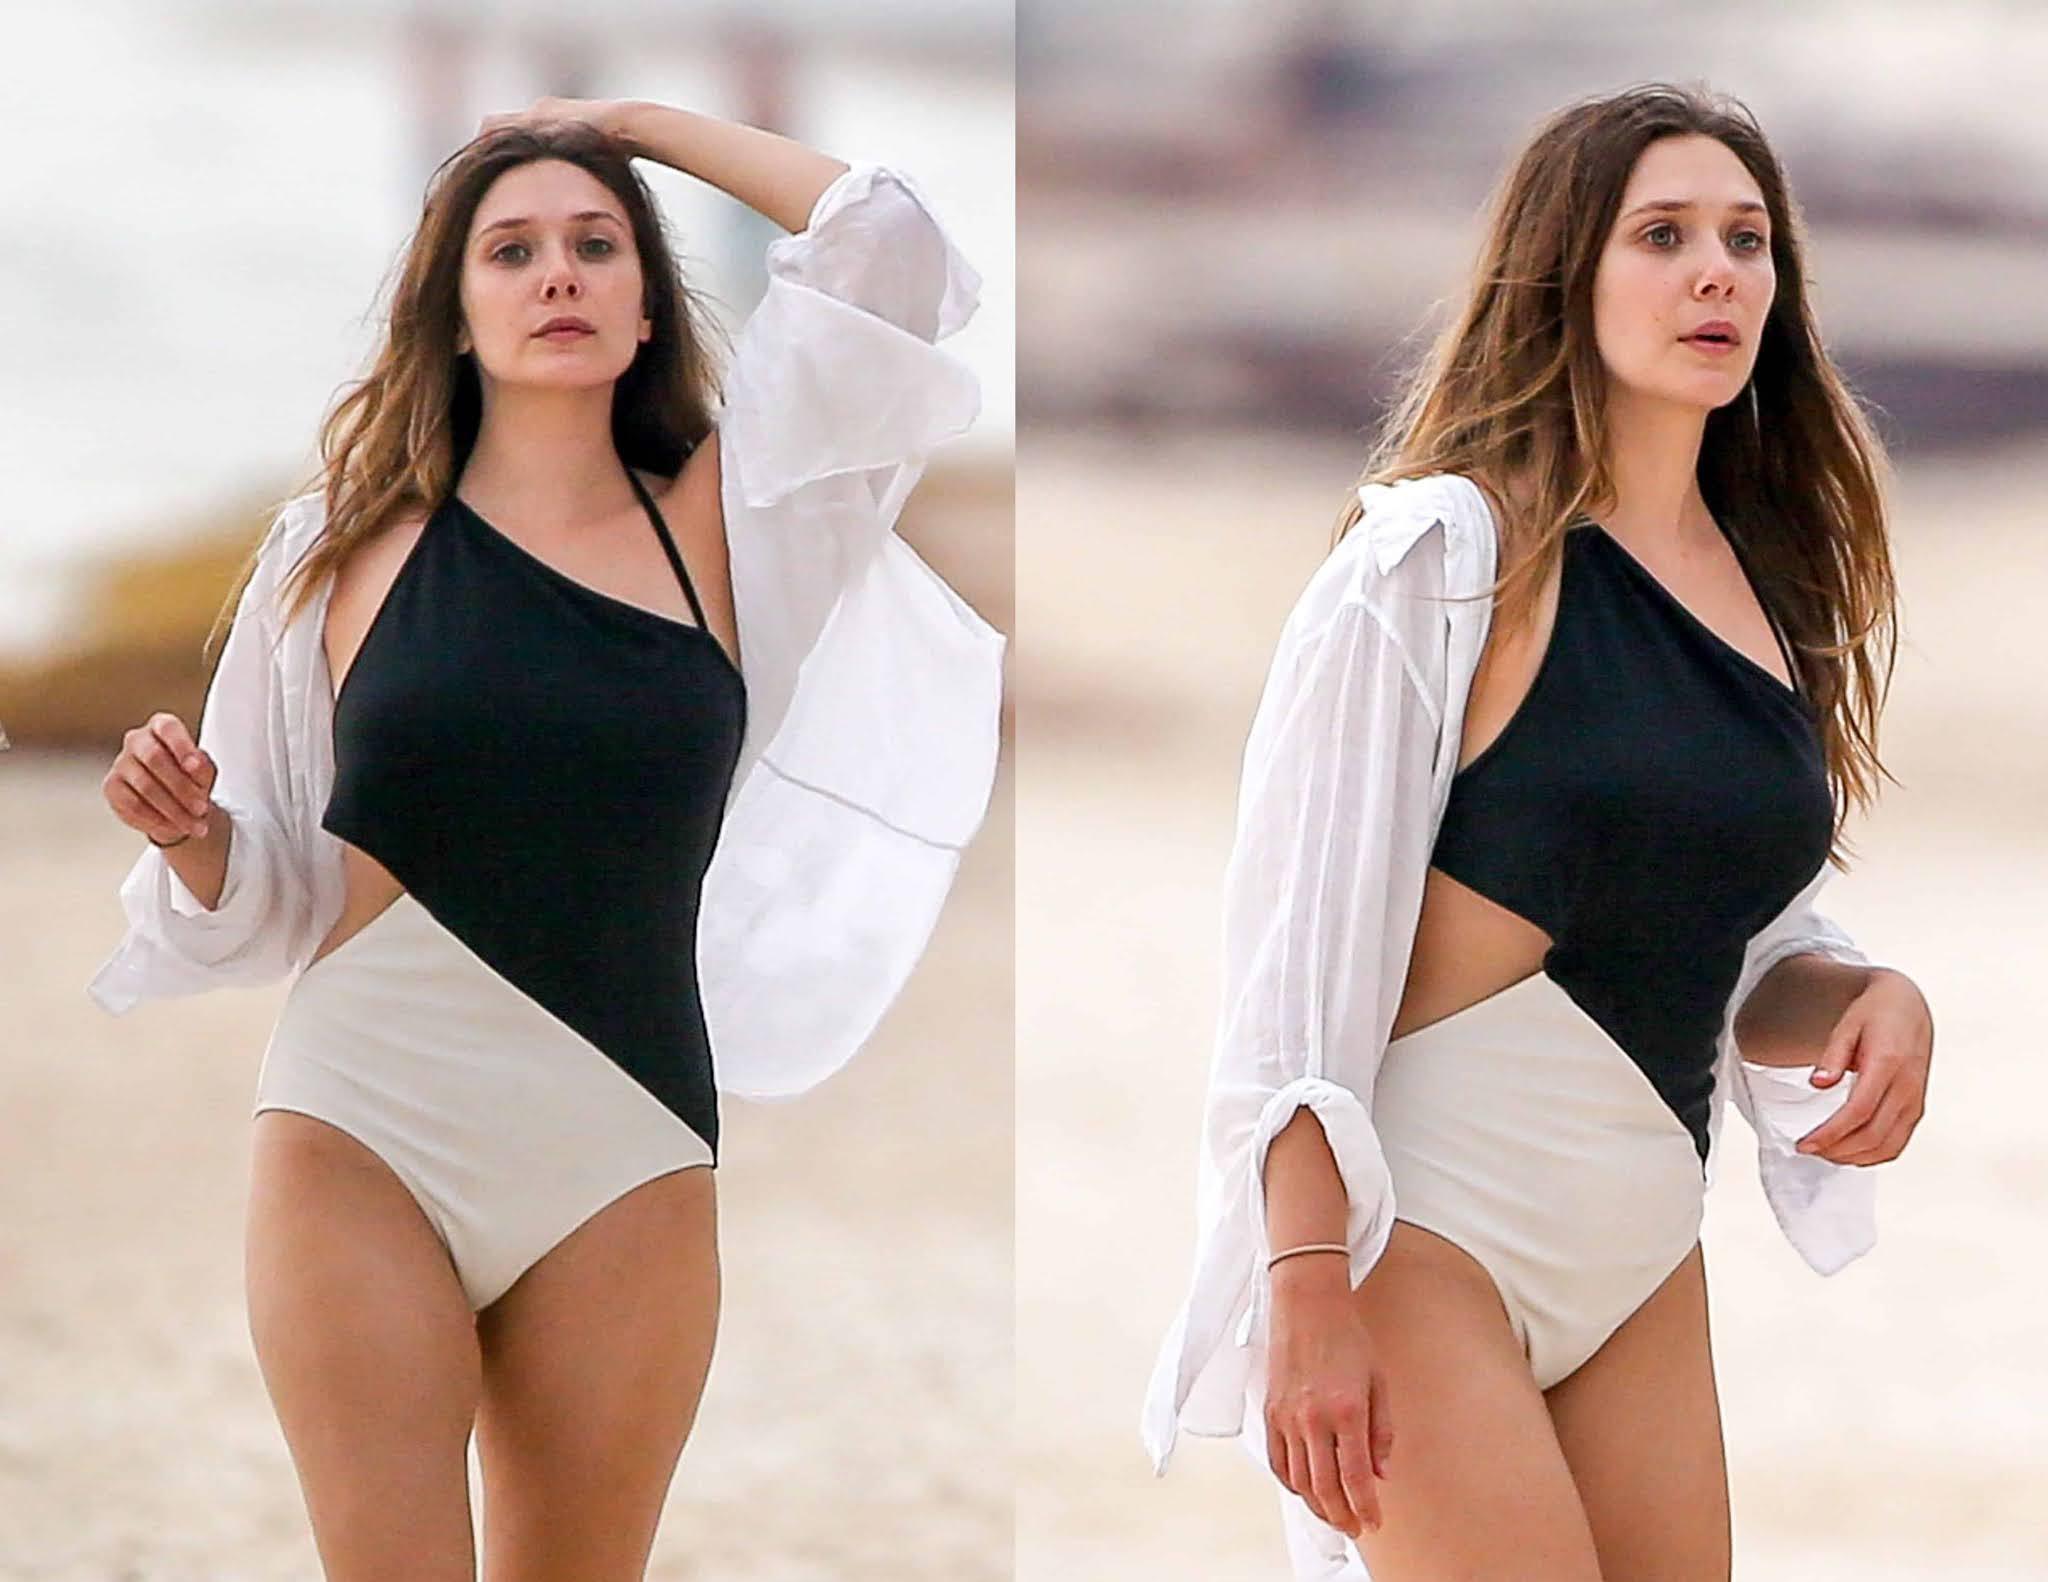 Elizabeth Olsen Sexy Photos: Hot Bikini Pictures | Navel & Cleavage Show